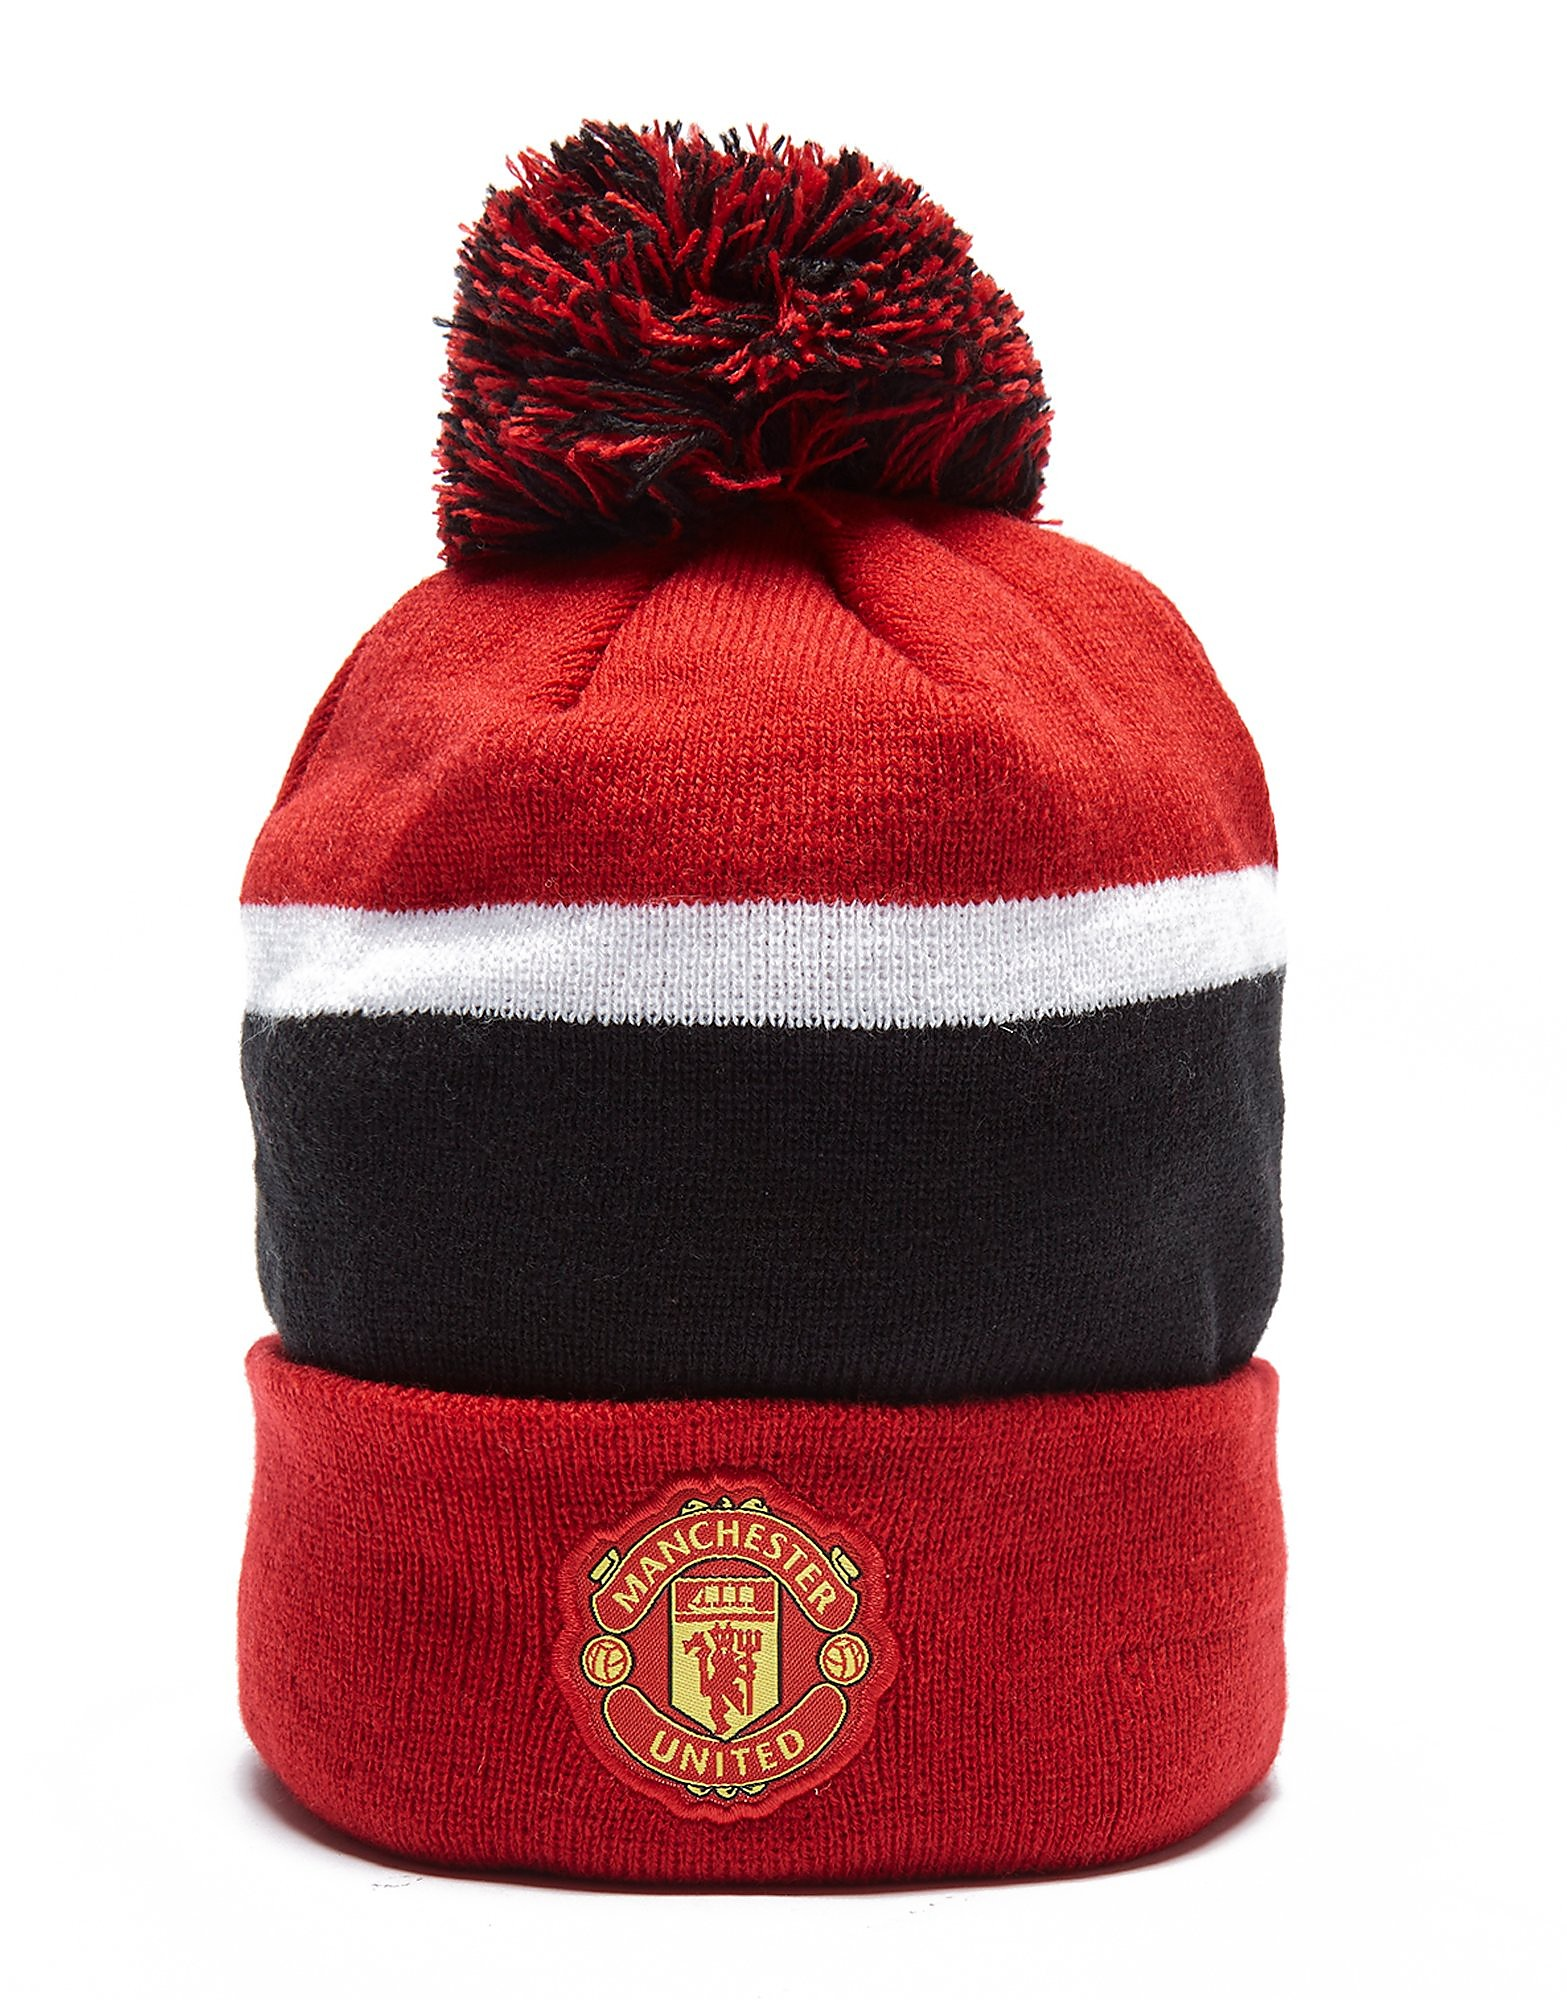 New Era Manchester United FC Bobble Knit Hat